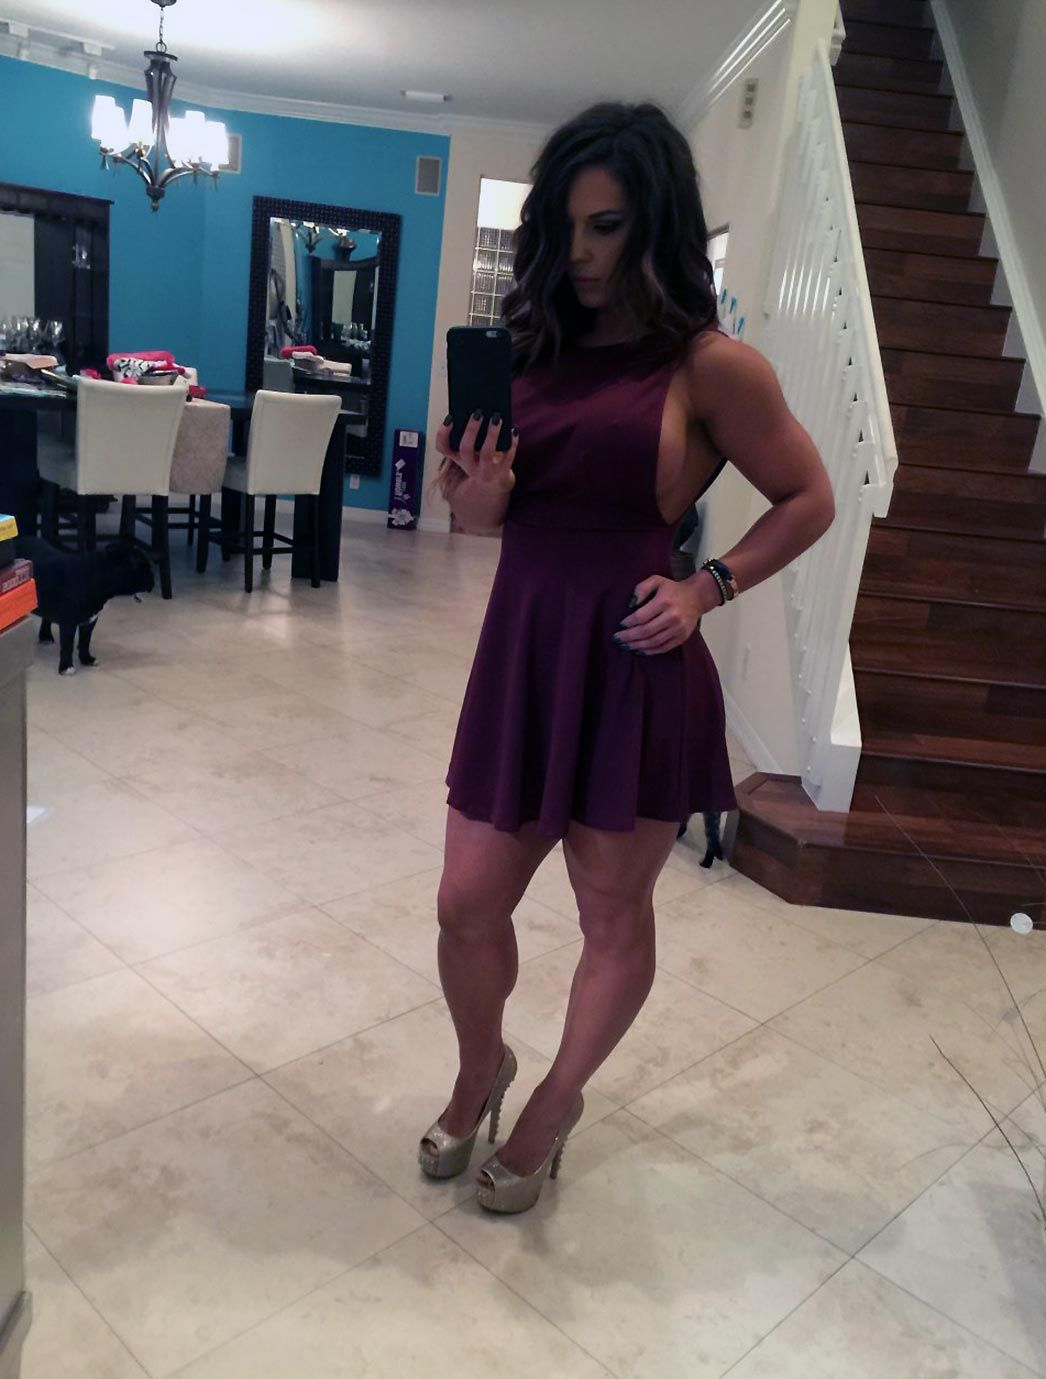 Celeste Bonin Nude Leaked The Fappening & Sexy 0275